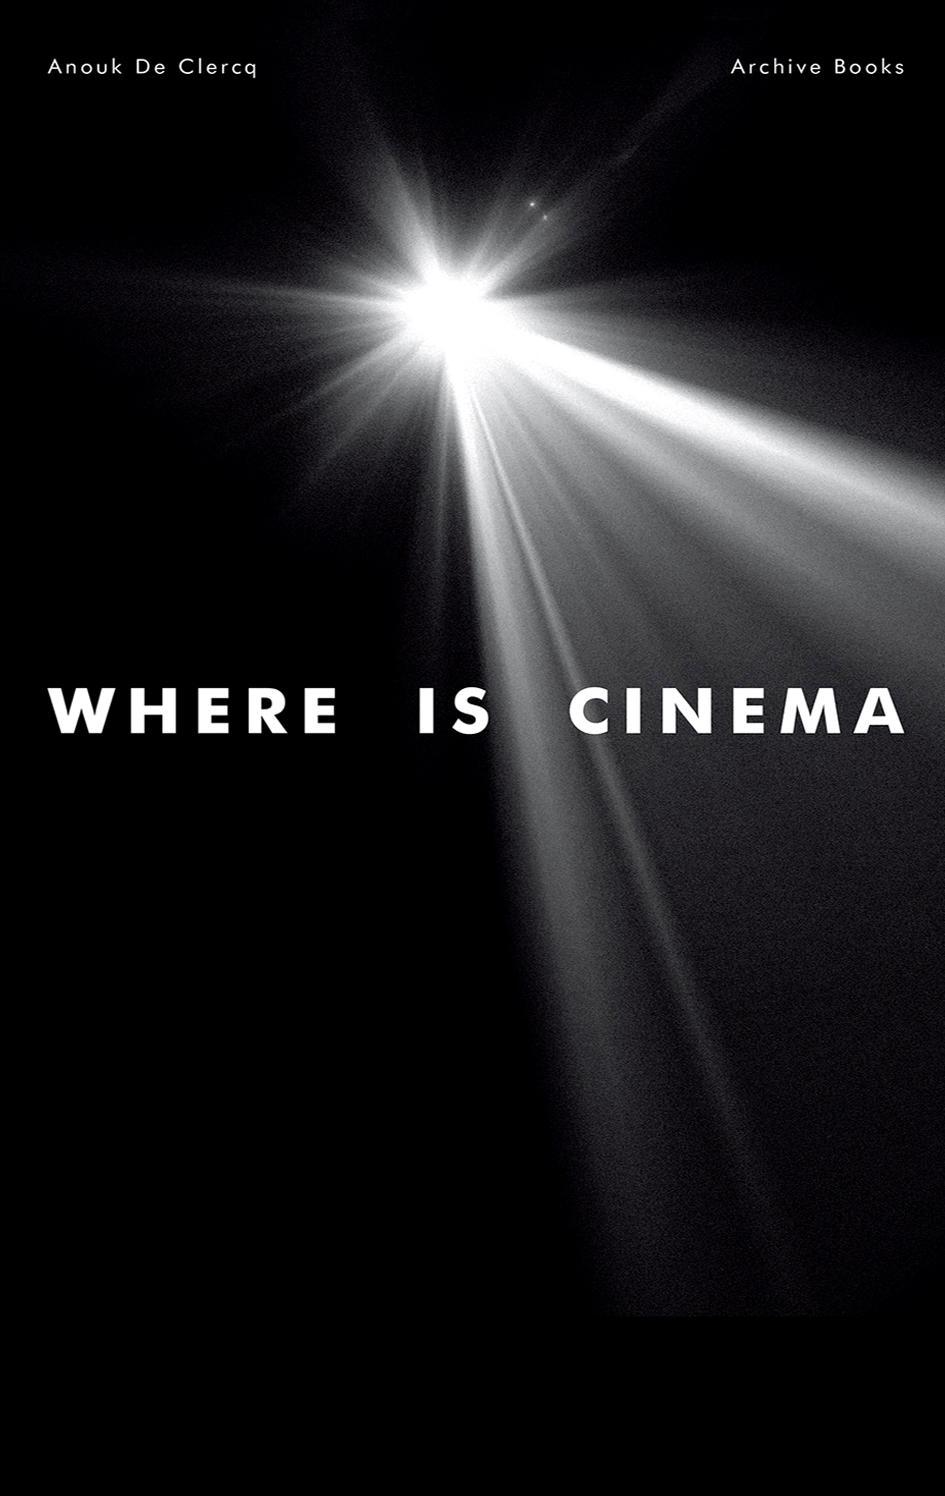 Where is Cinema?